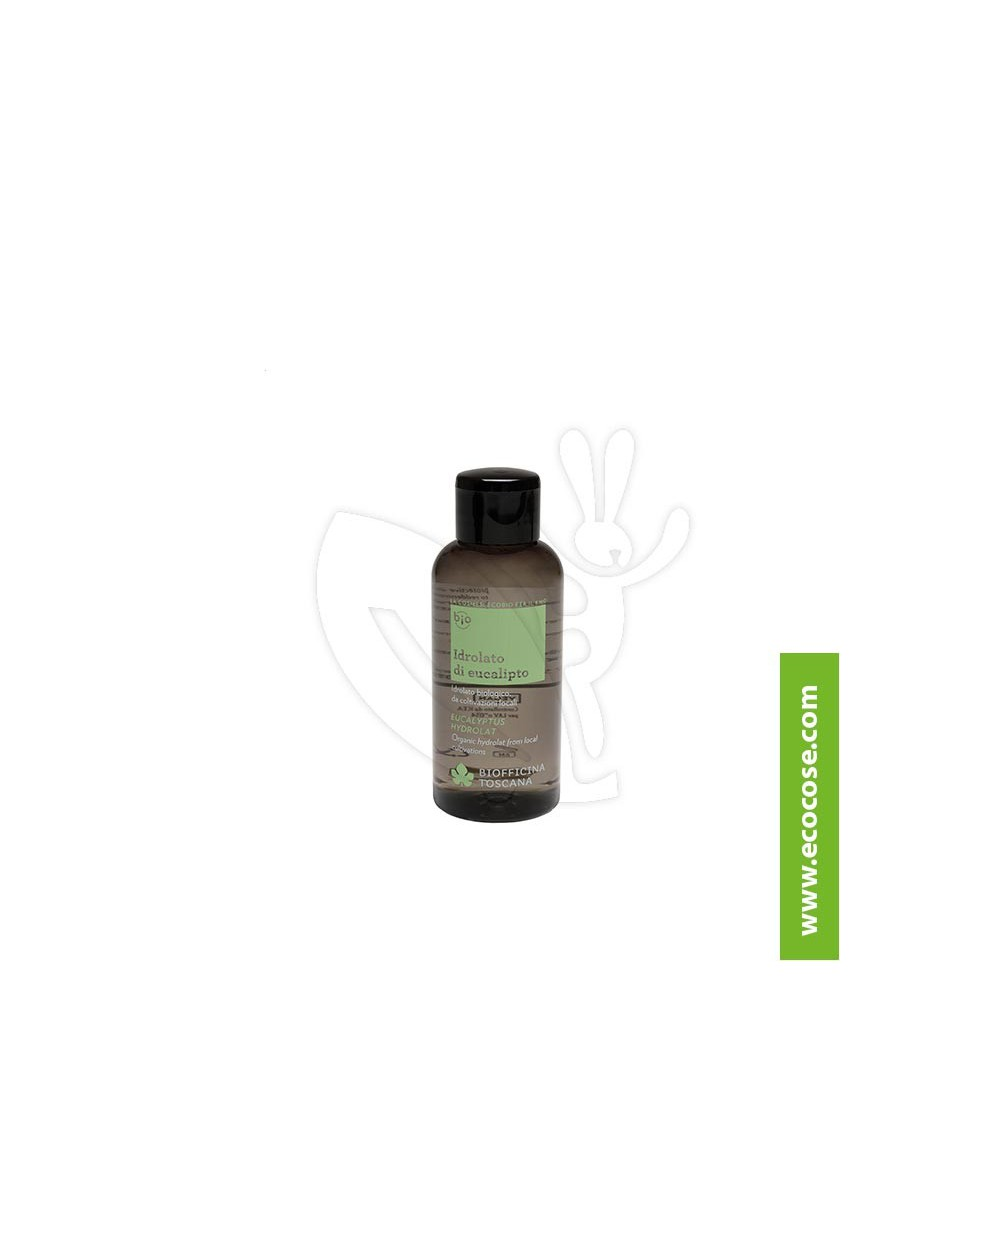 Biofficina Toscana - Idrolato di eucalipto